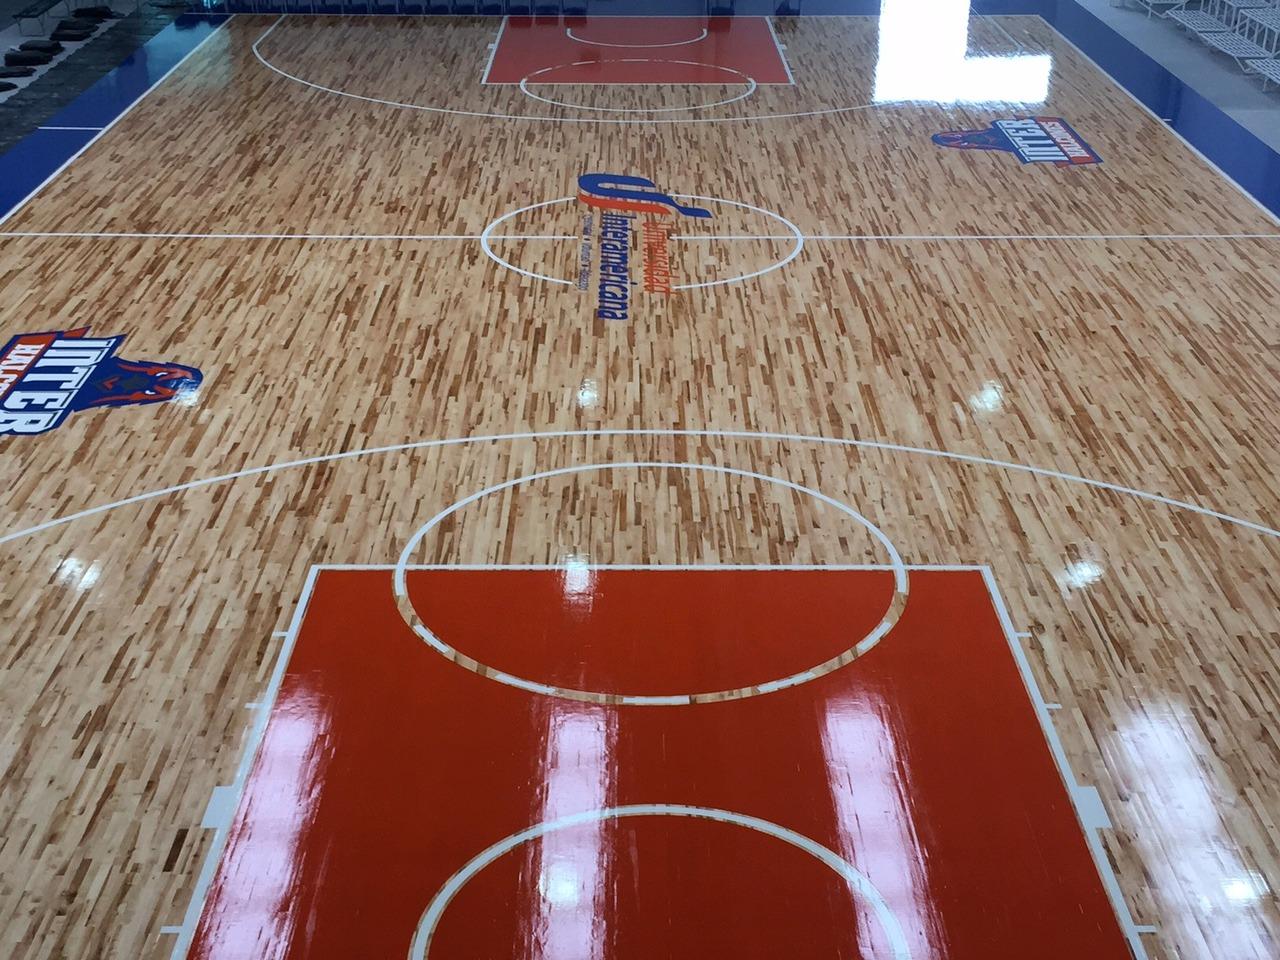 Imagenes de cancha de basketball